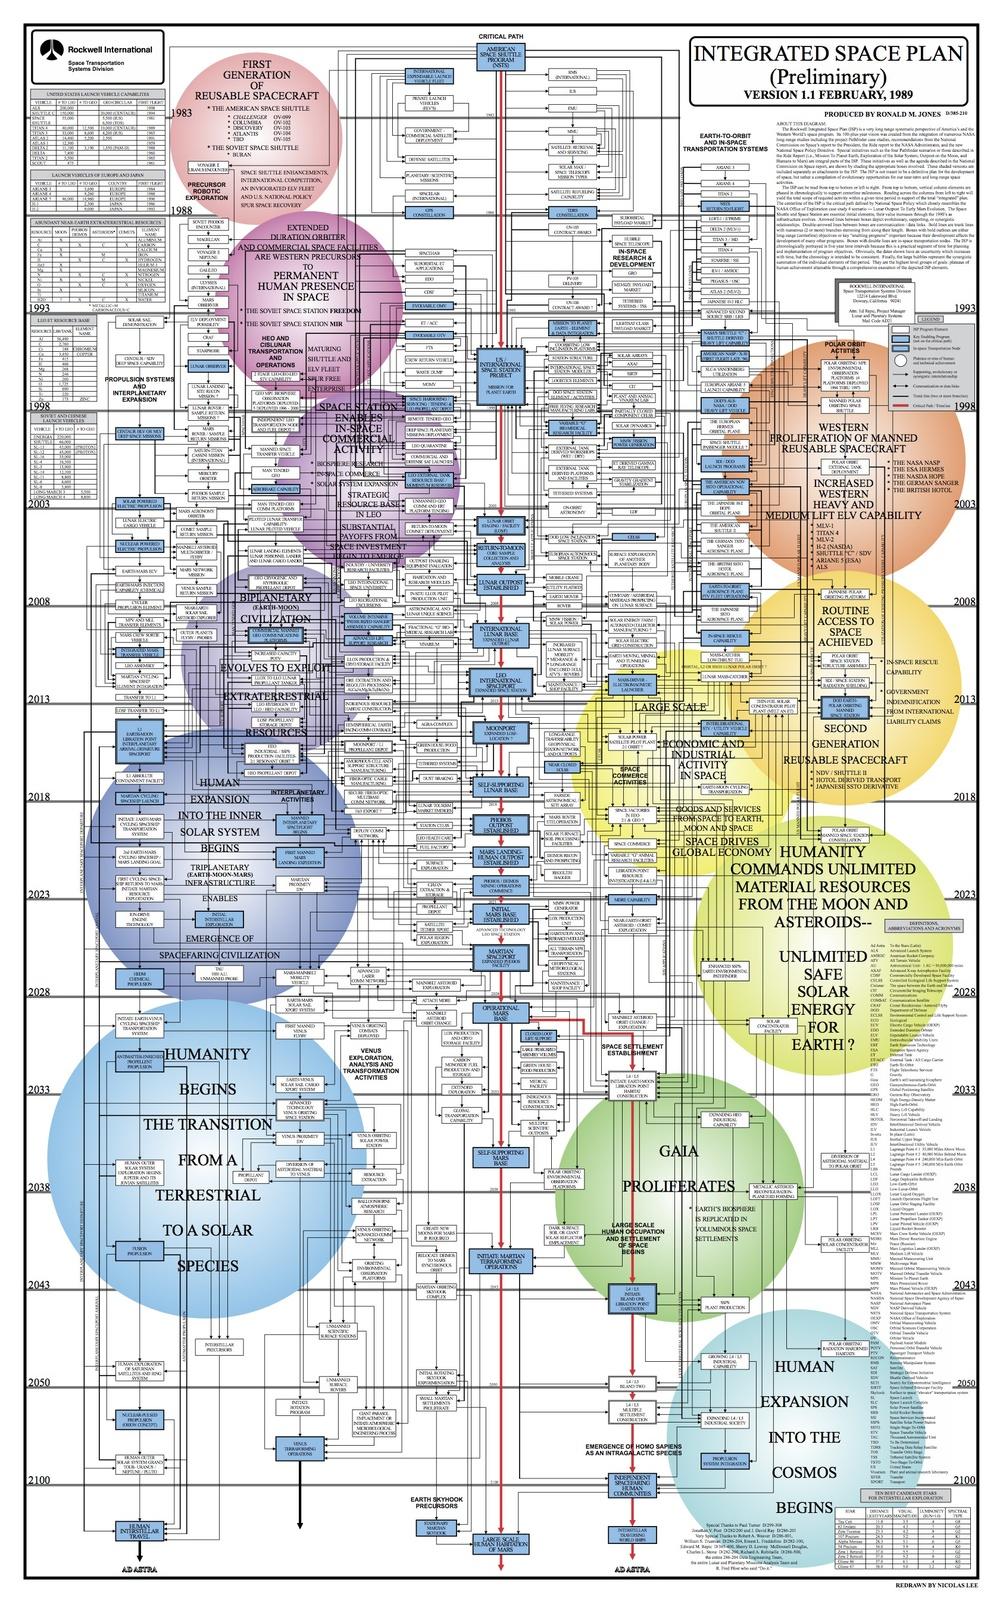 integratedspaceplan2color.jpg